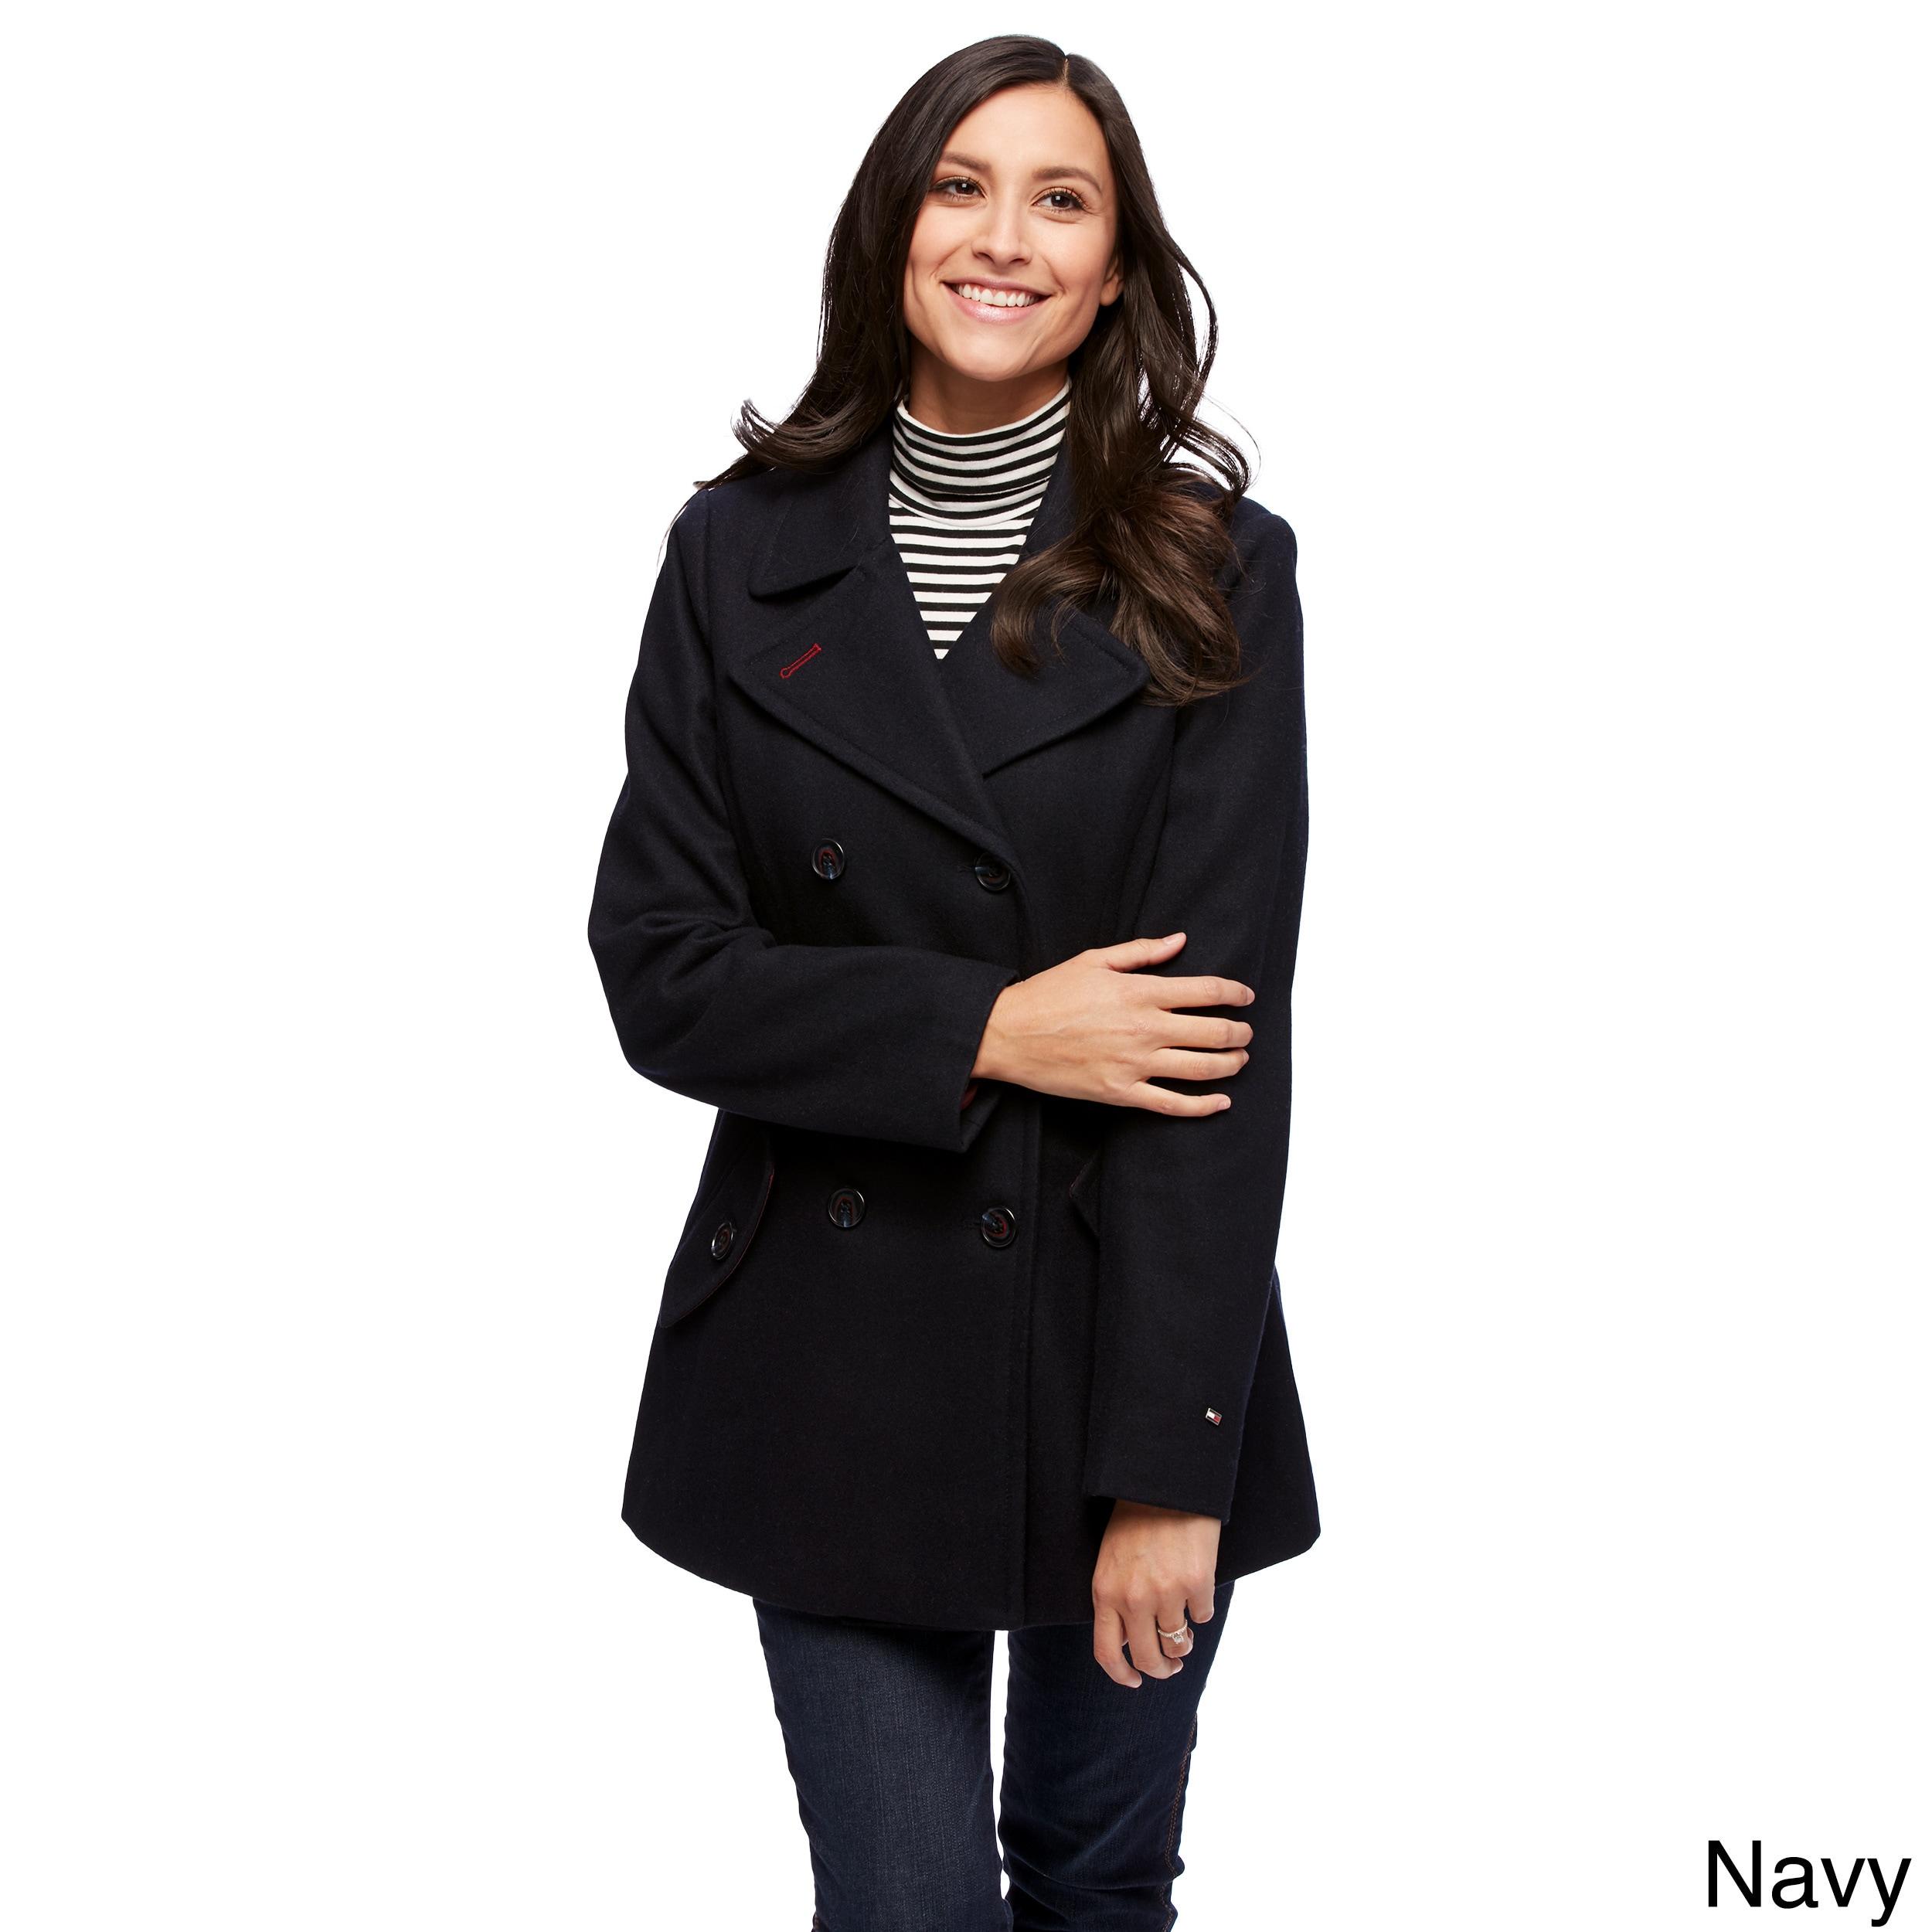 Tommy Hilfiger Womens Wool-Blend Neoprene Fashion Coat